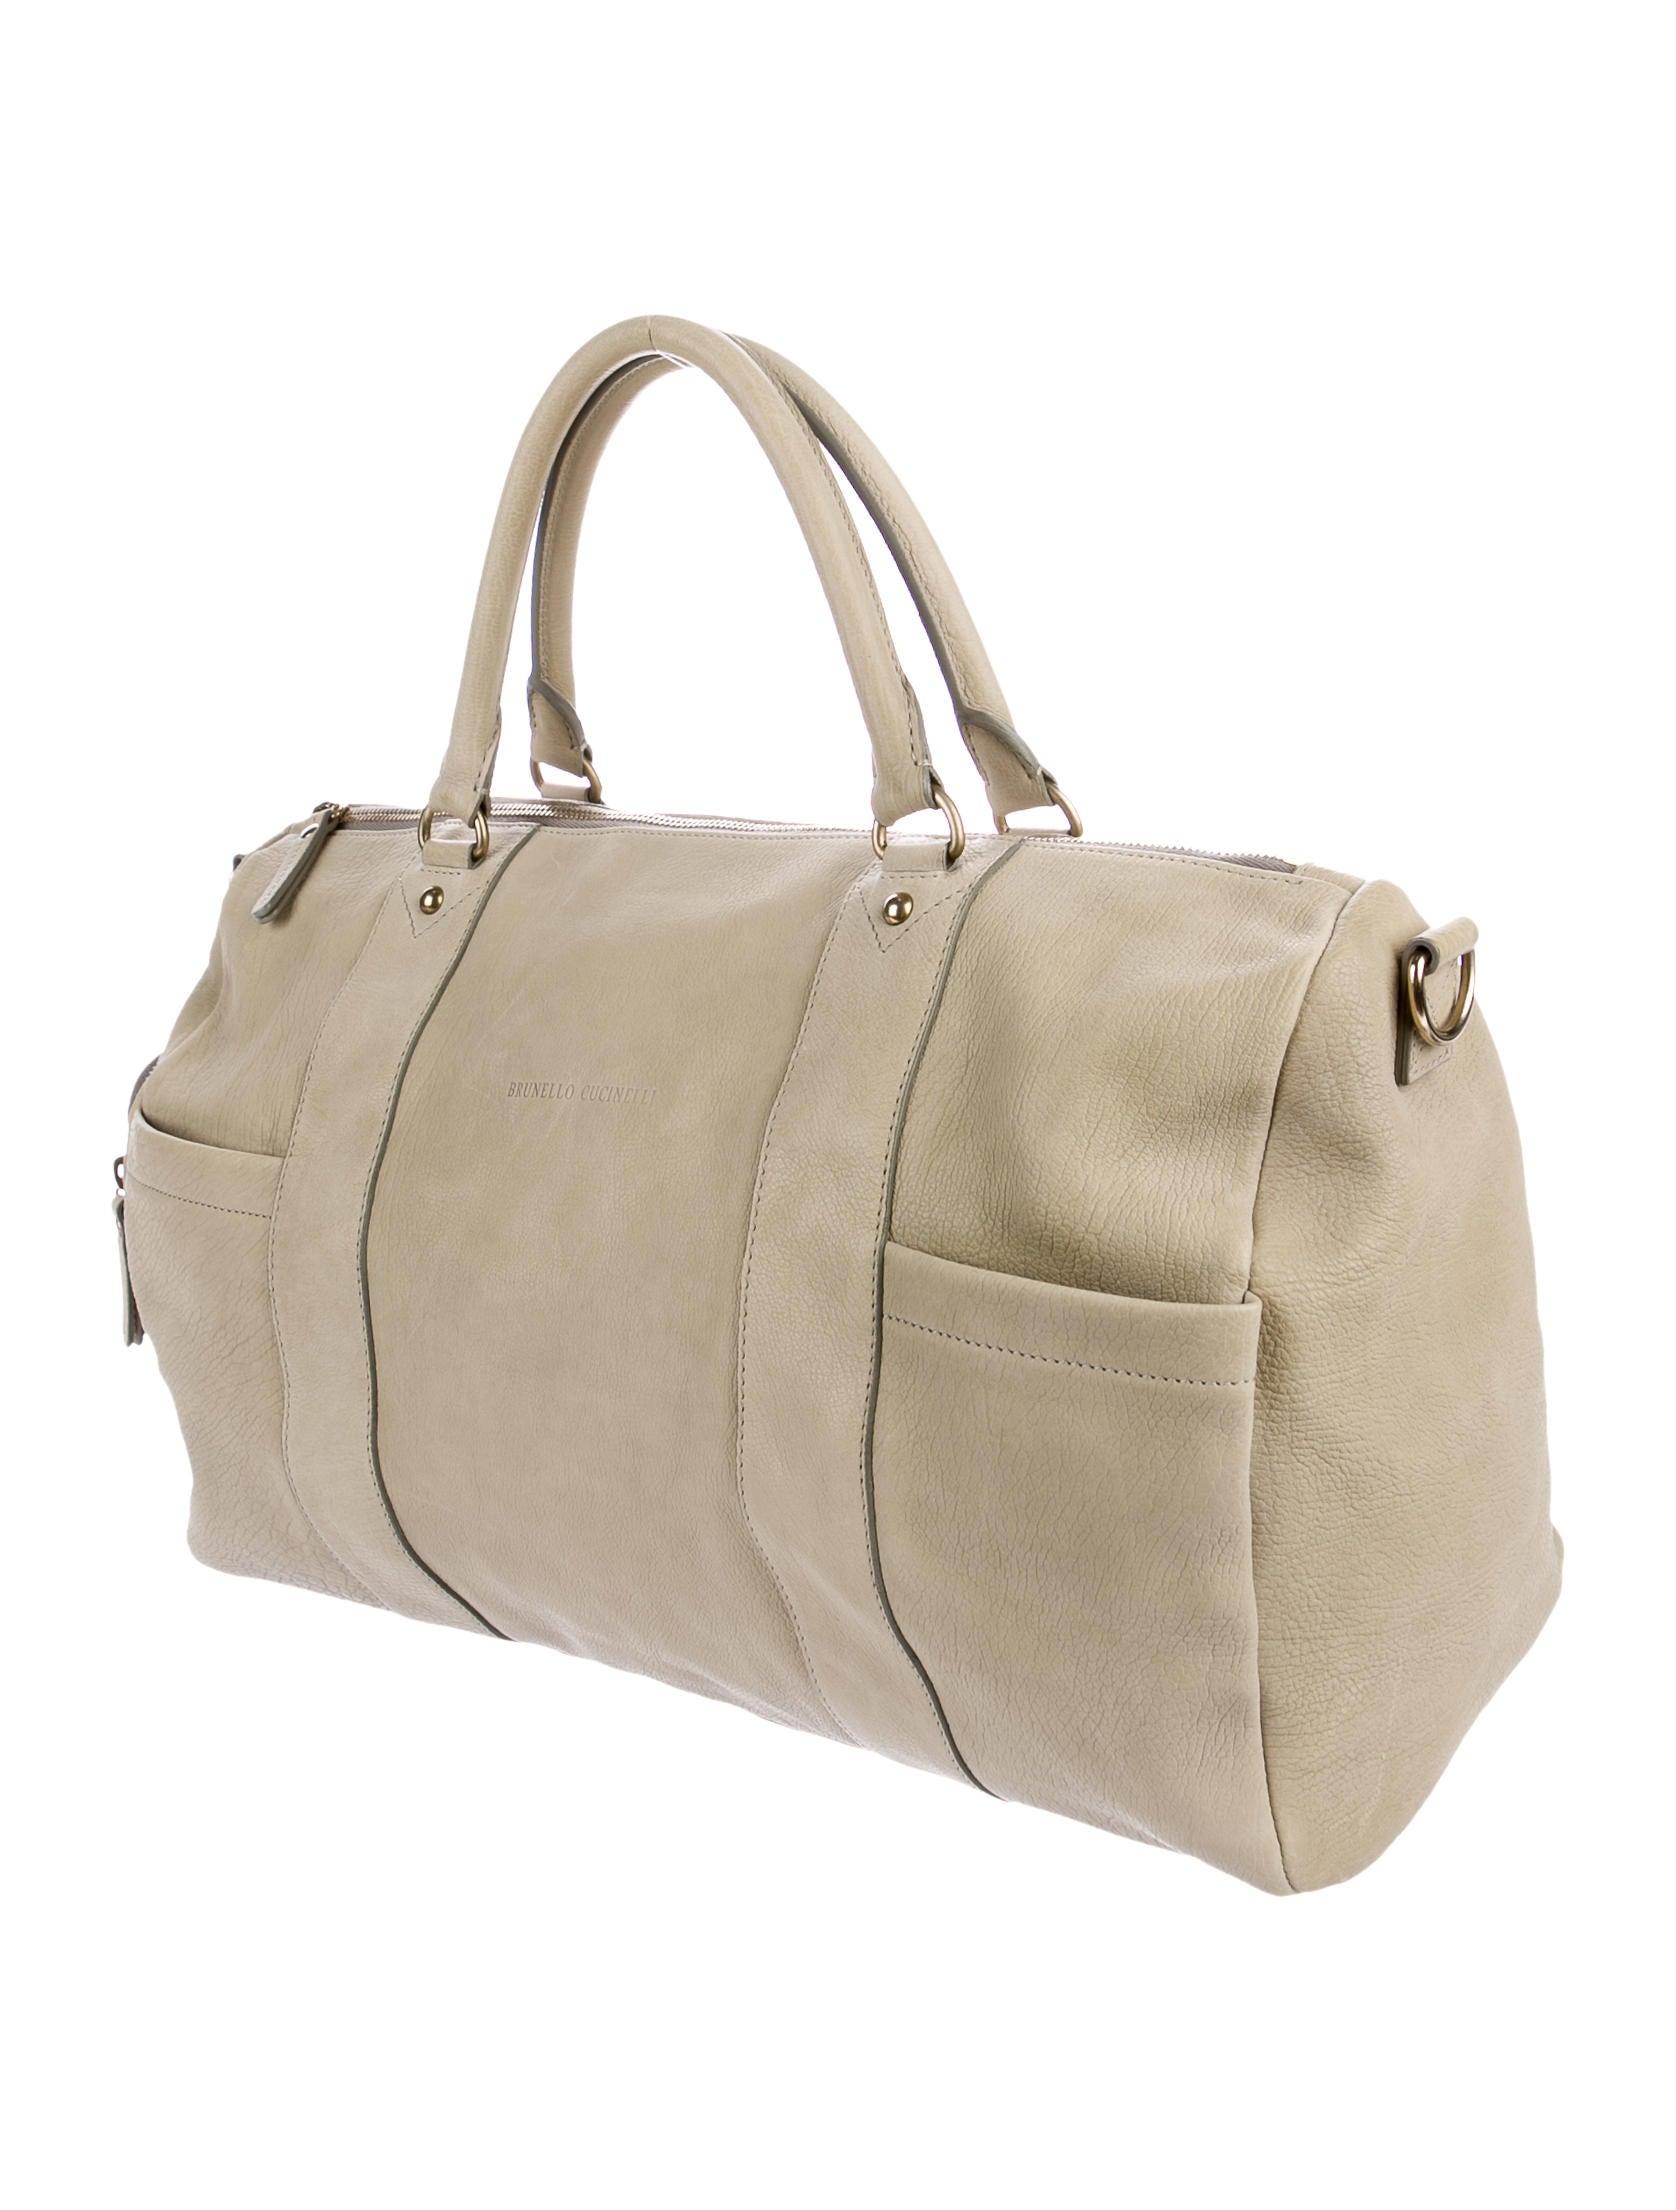 Boston Bag Patchwork Tutorial: Brunello Cucinelli Boston Bag - Handbags - BRU47286